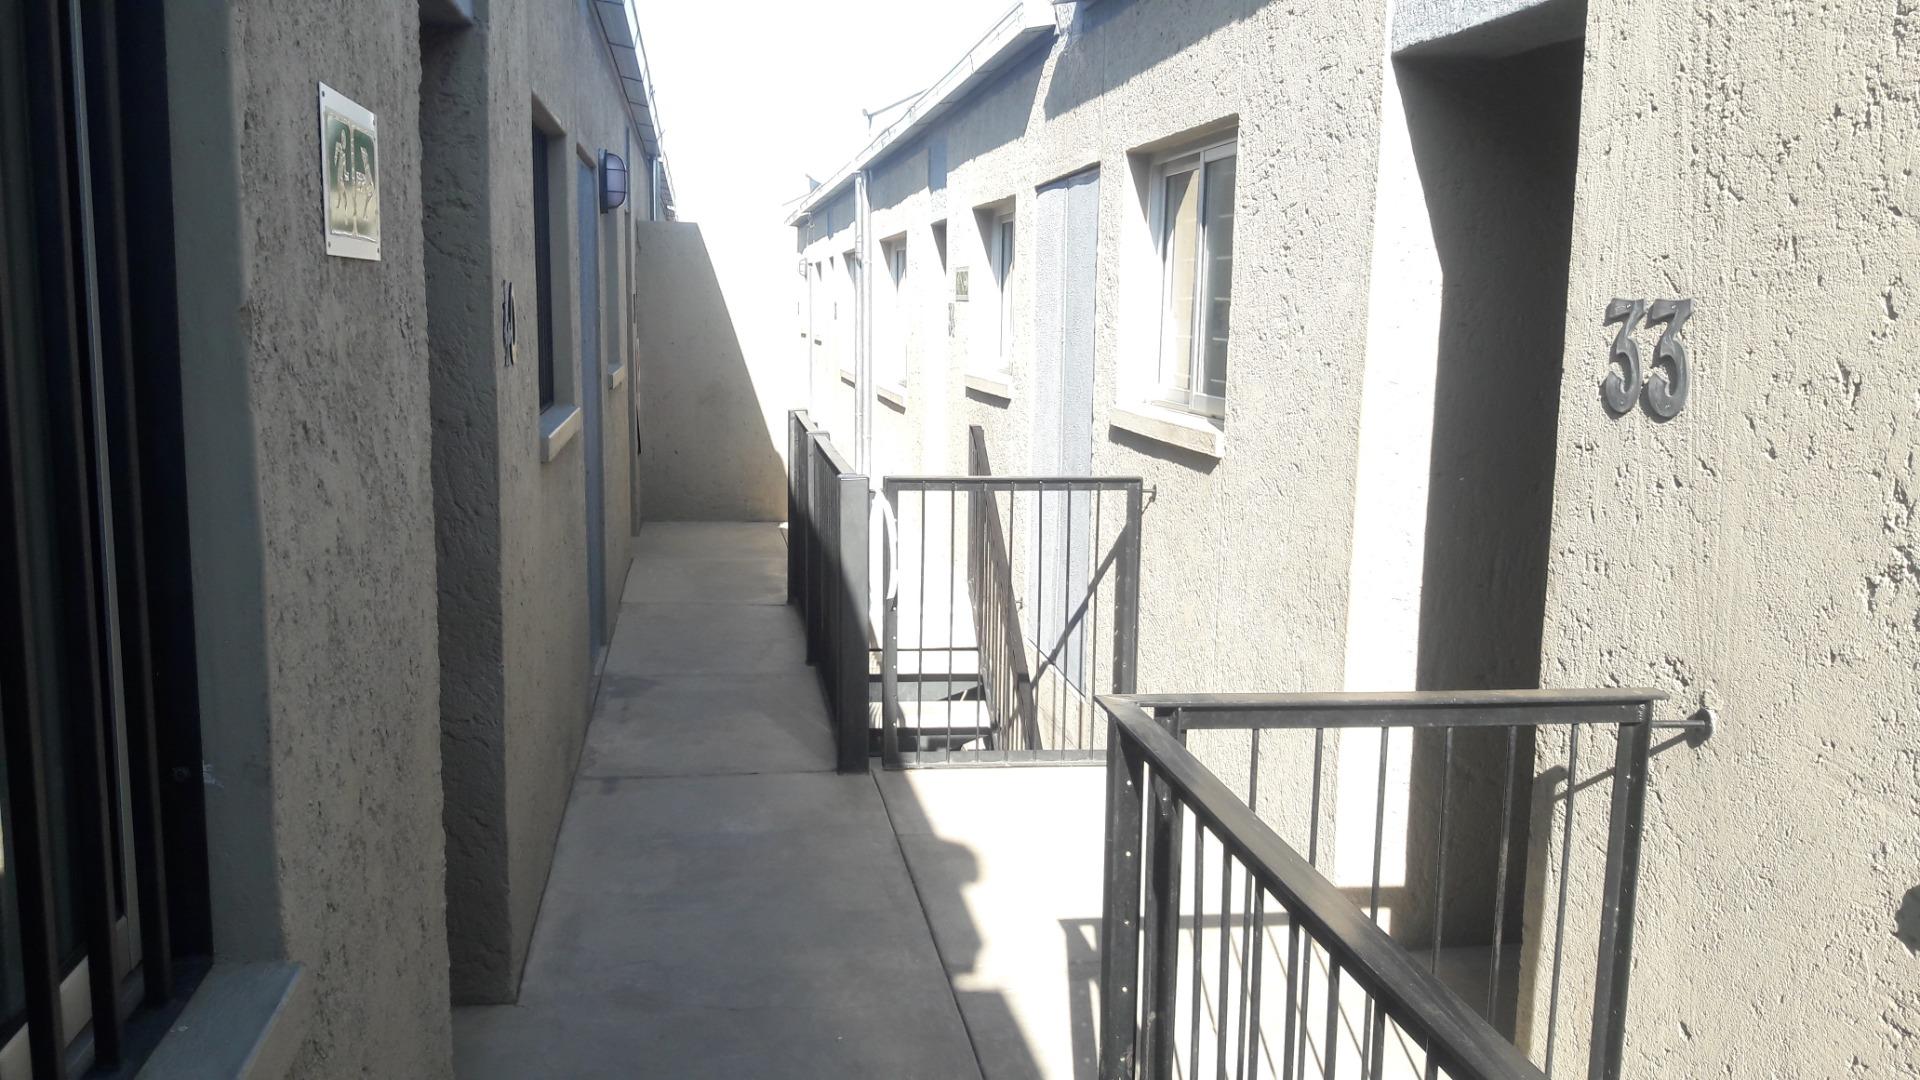 2 Bedroom Apartment / Flat For Sale in Windhoek North